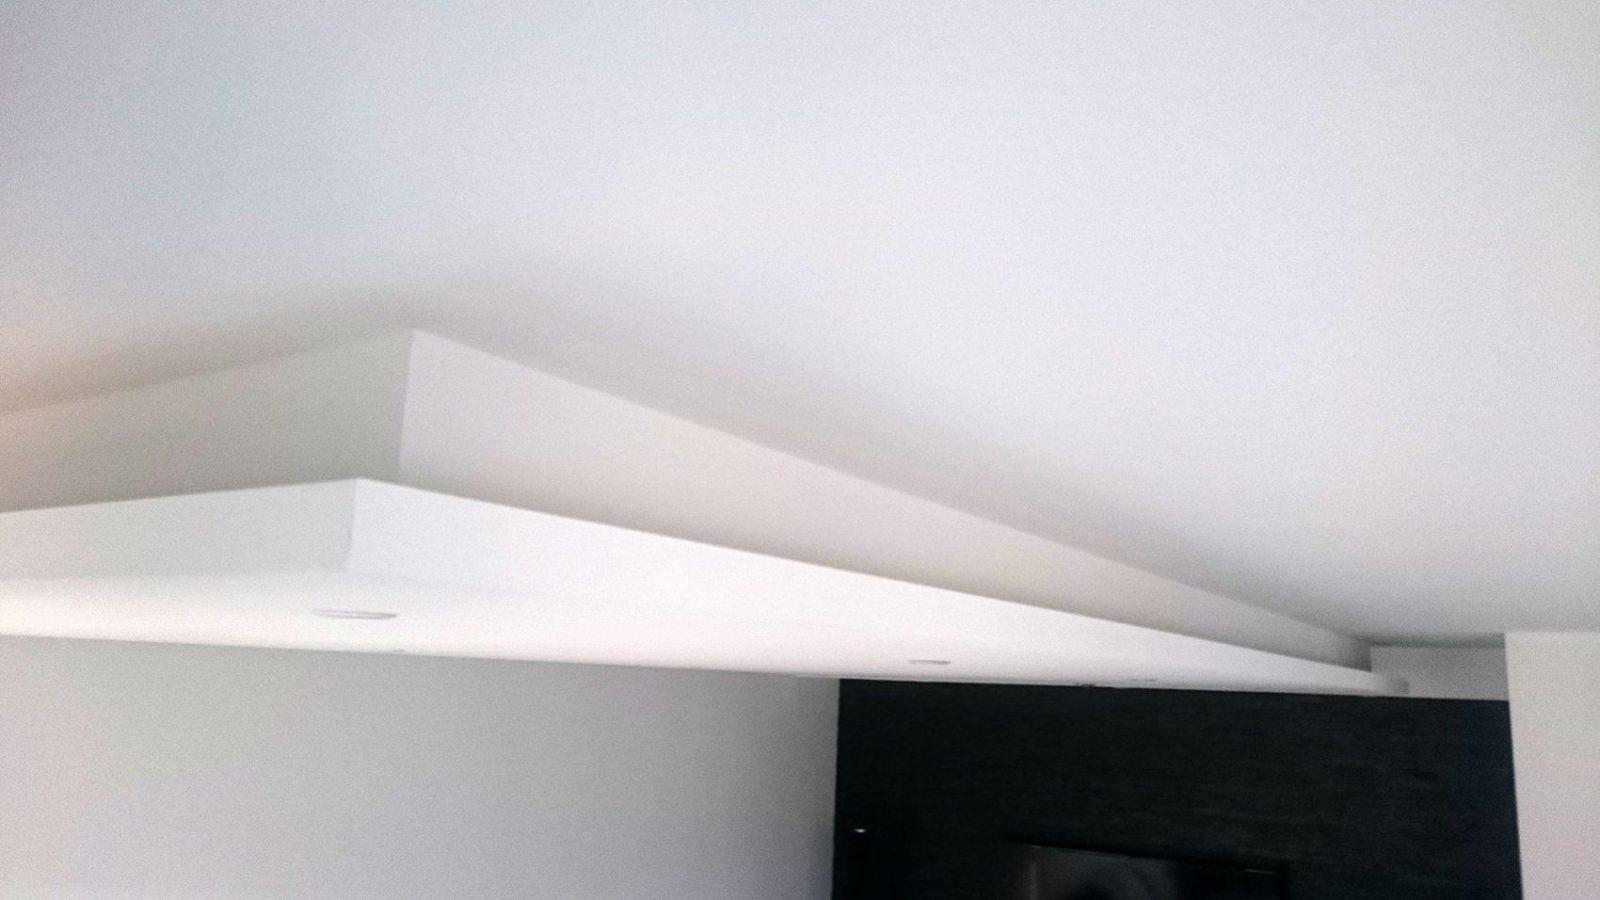 Indirekte Beleuchtung Selber Bauen Rigips  Afdecker von Indirekte Beleuchtung Selber Bauen Wand Bild